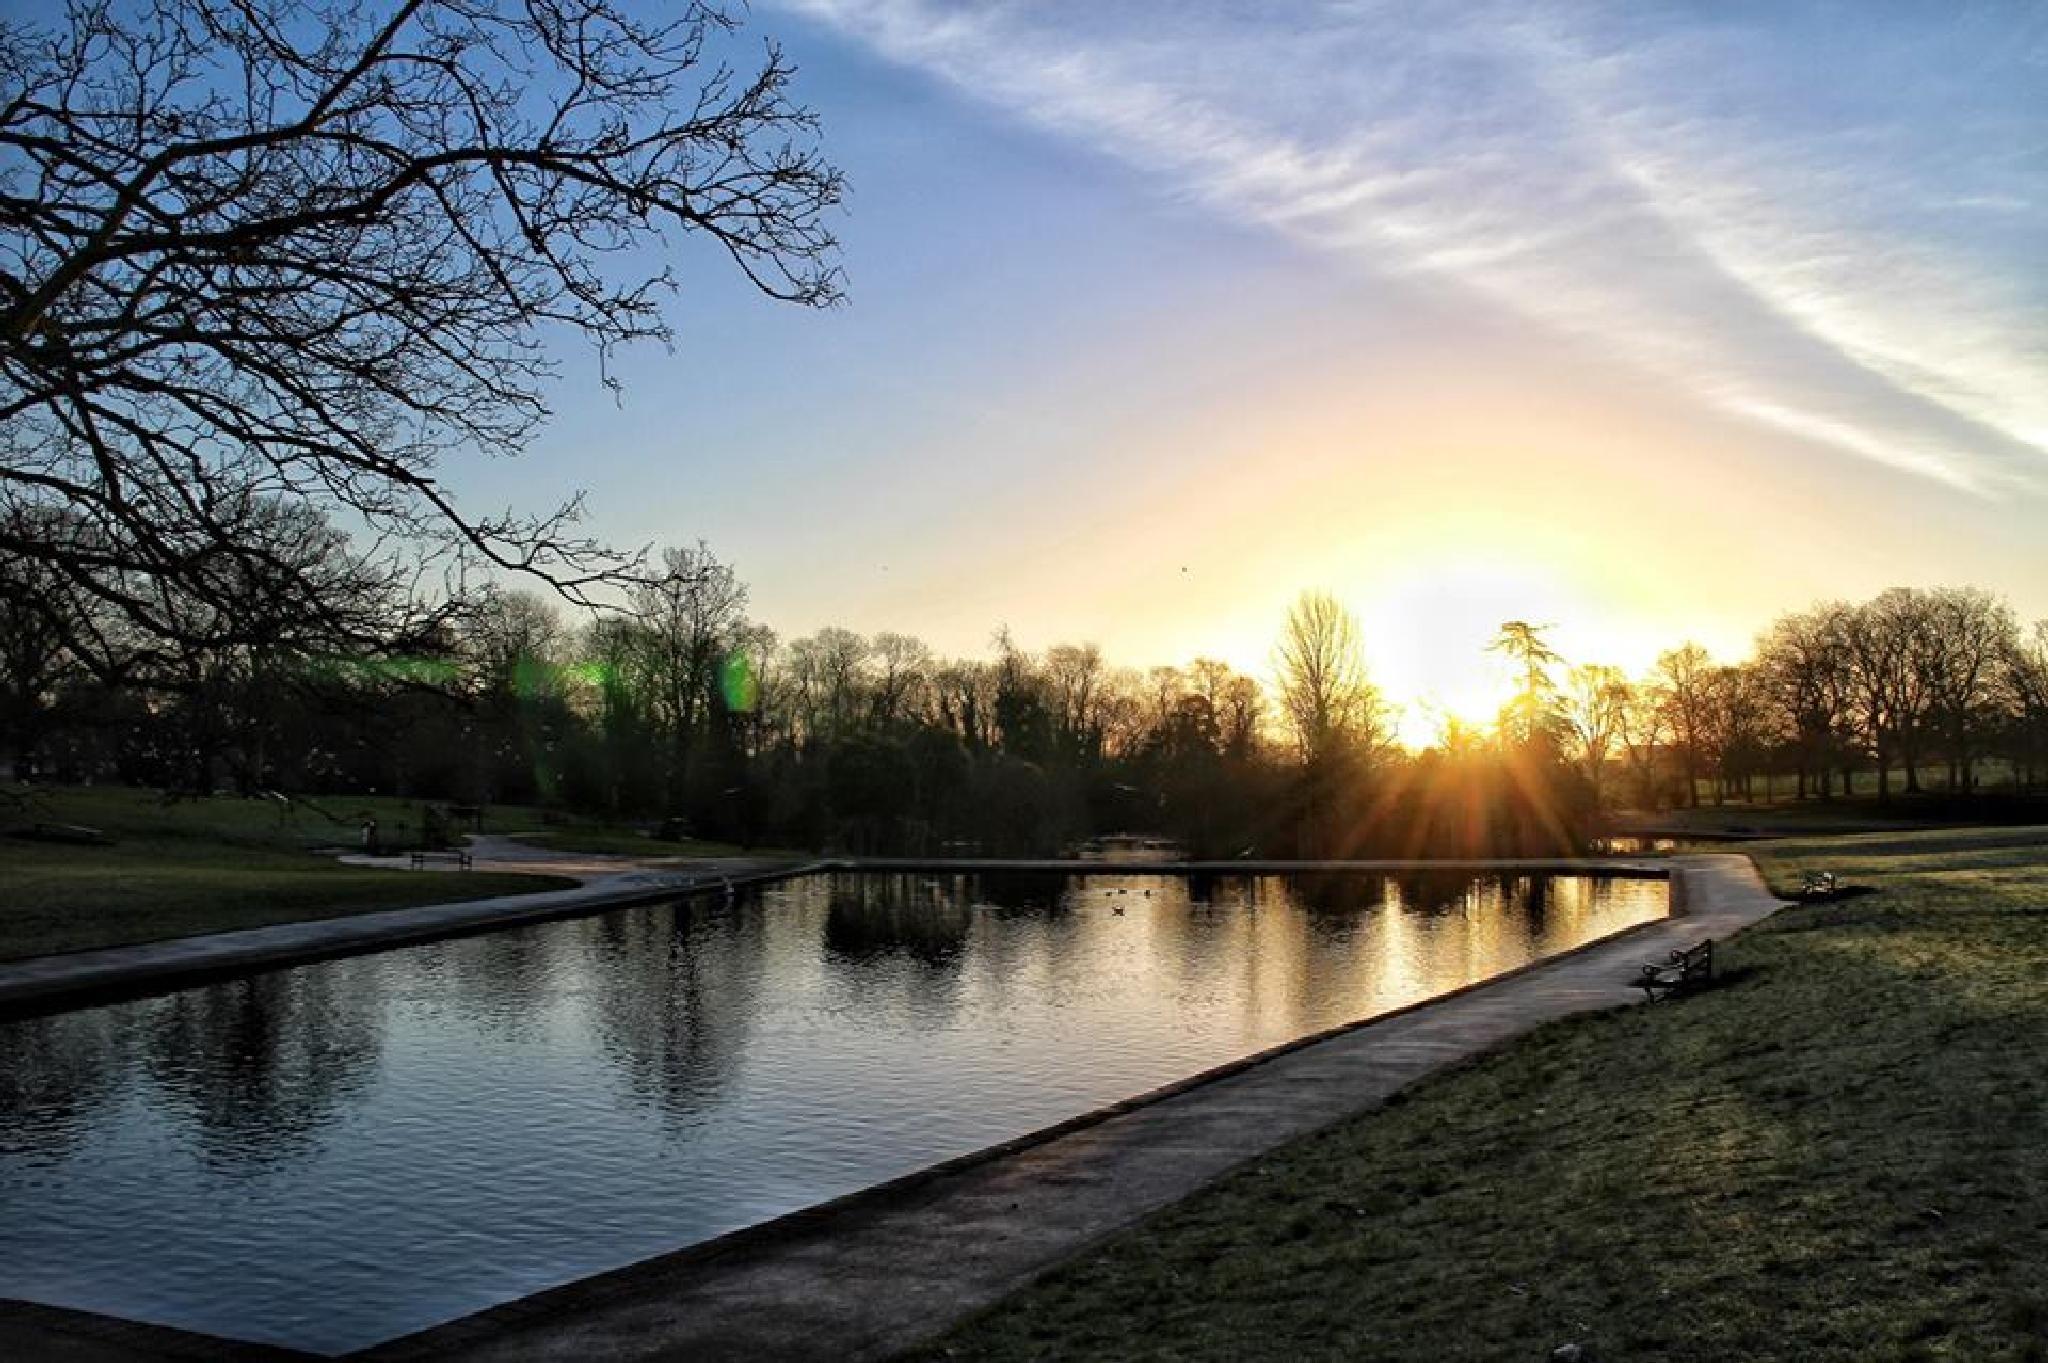 Abington Park  by Luke Barklamb